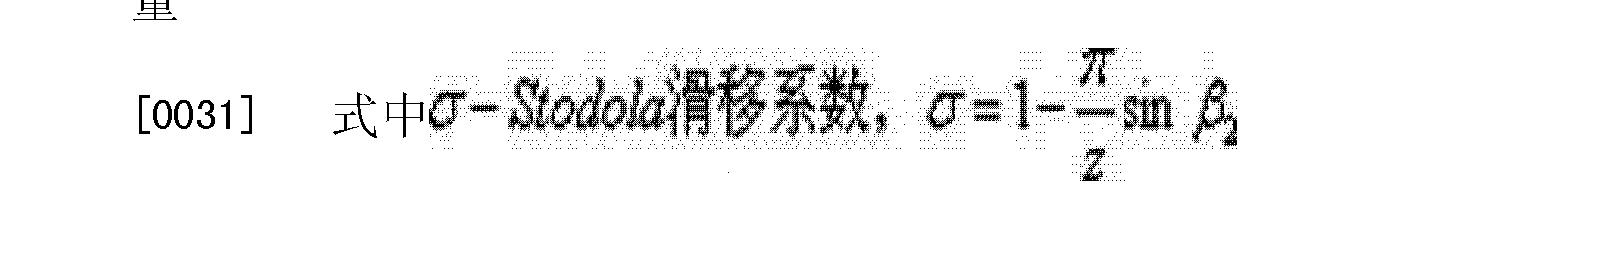 Figure CN203685691UD00052